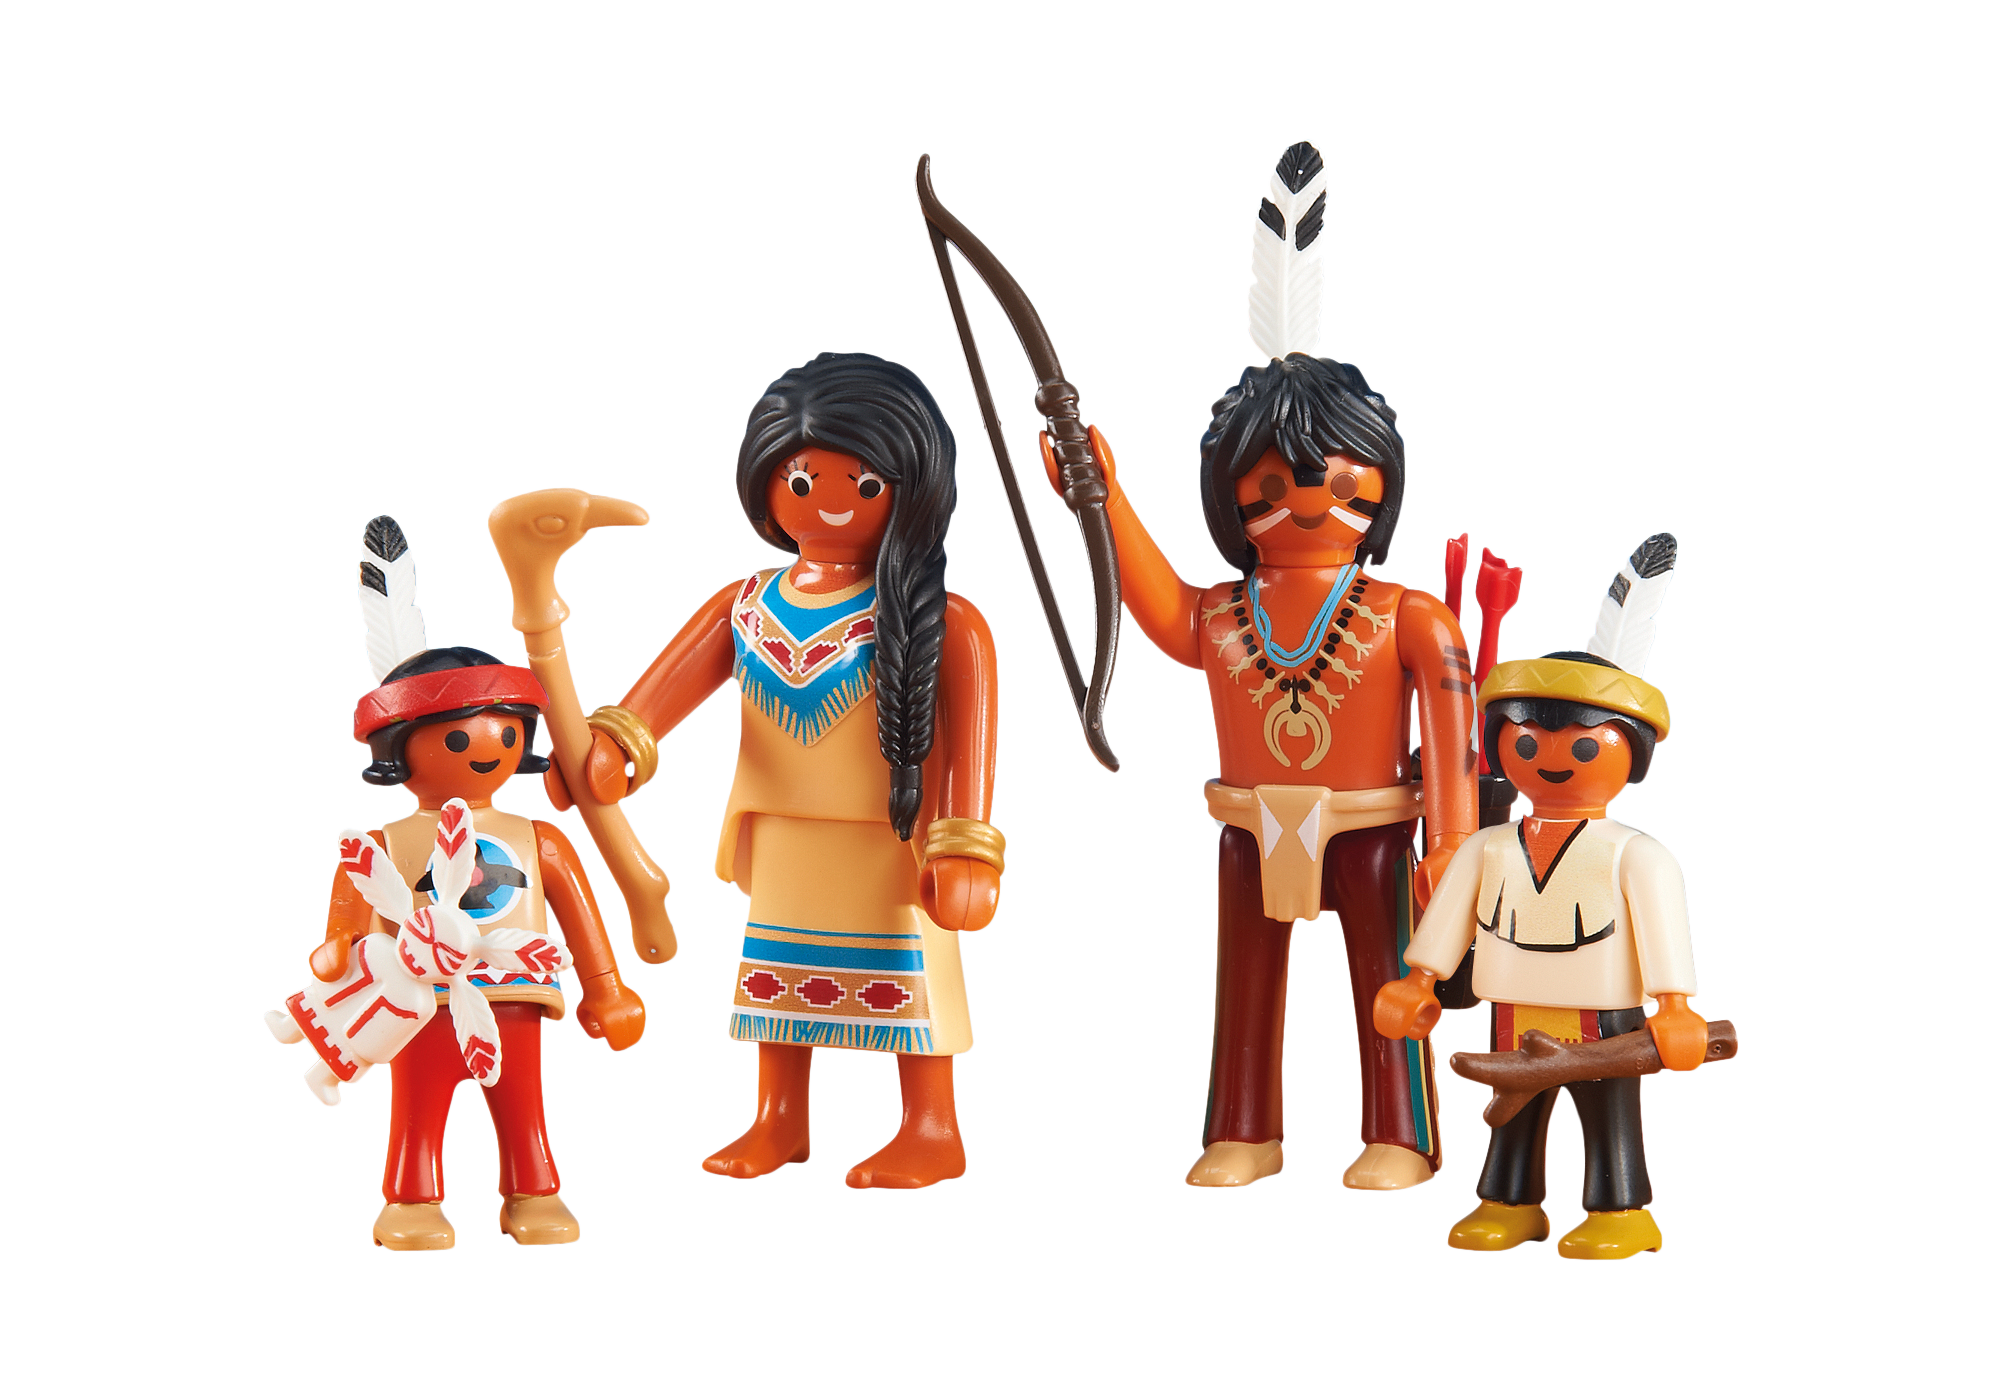 http://media.playmobil.com/i/playmobil/6322_product_detail/Native American Family II